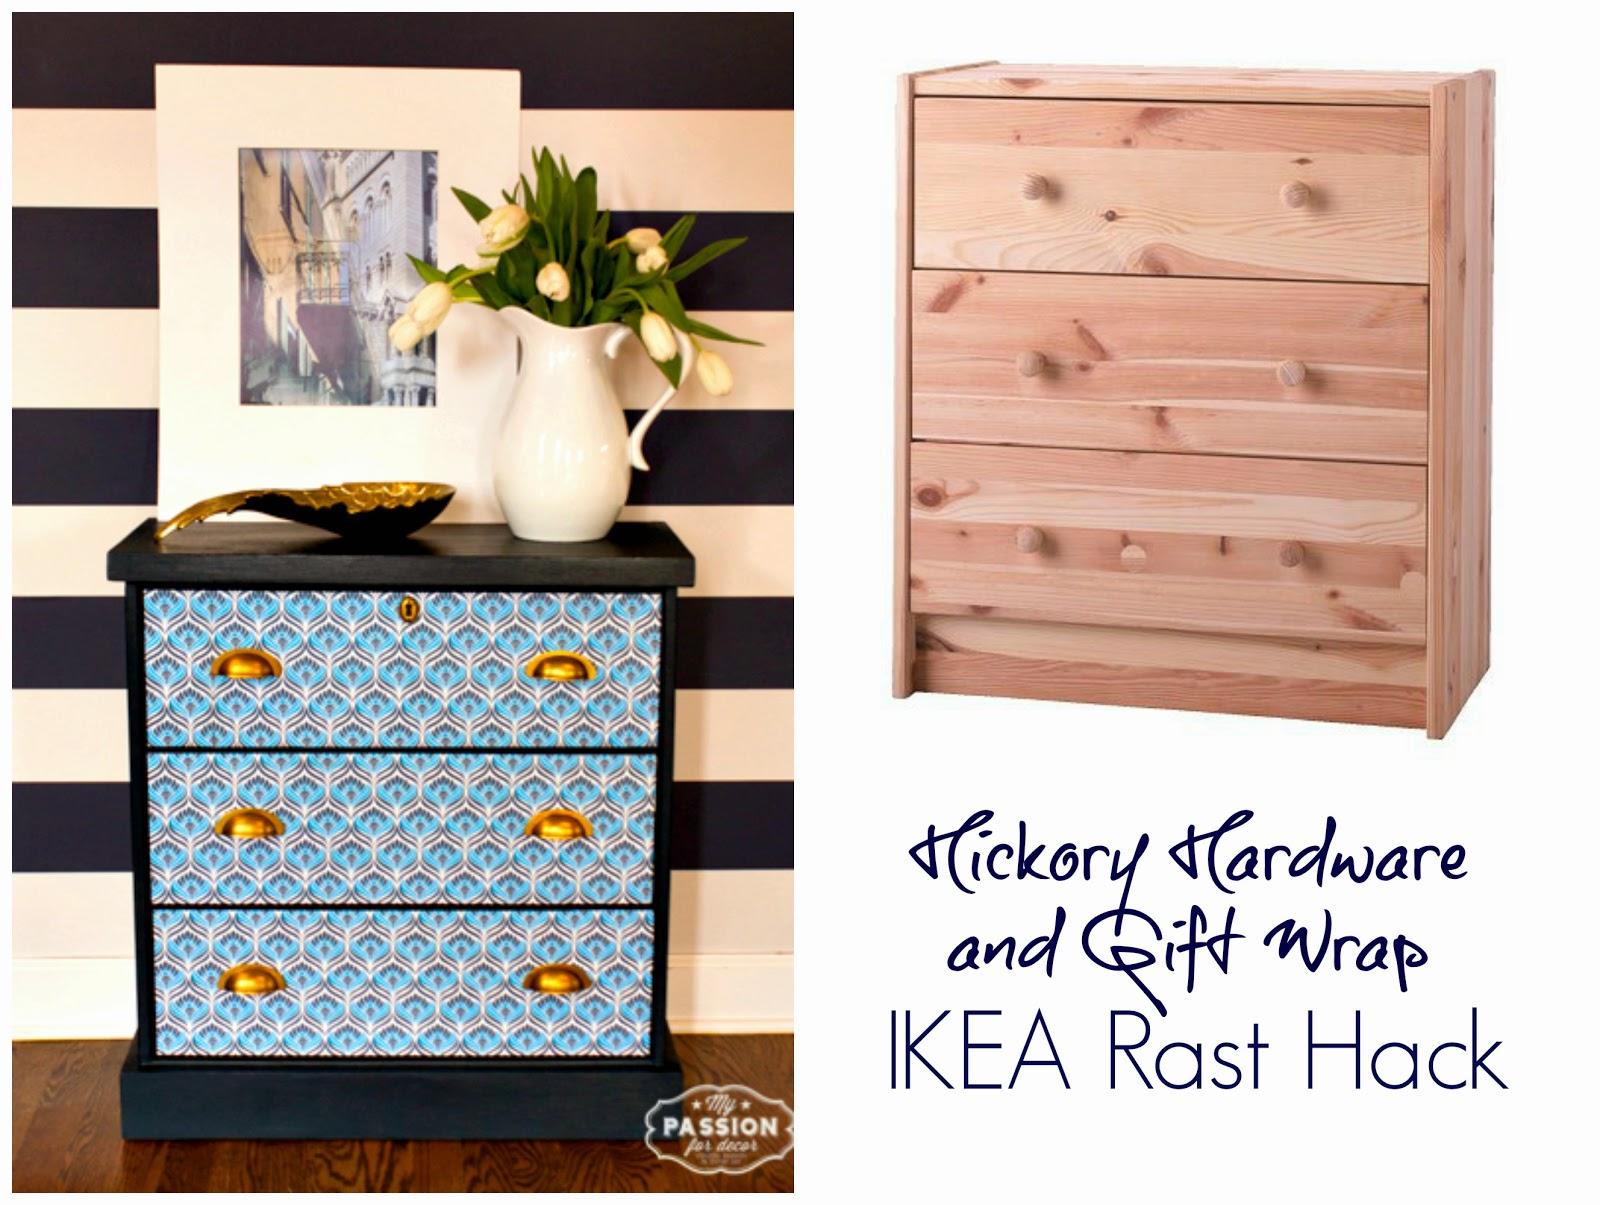 gift wrap hardware ikea rast hack - Ikea Rast